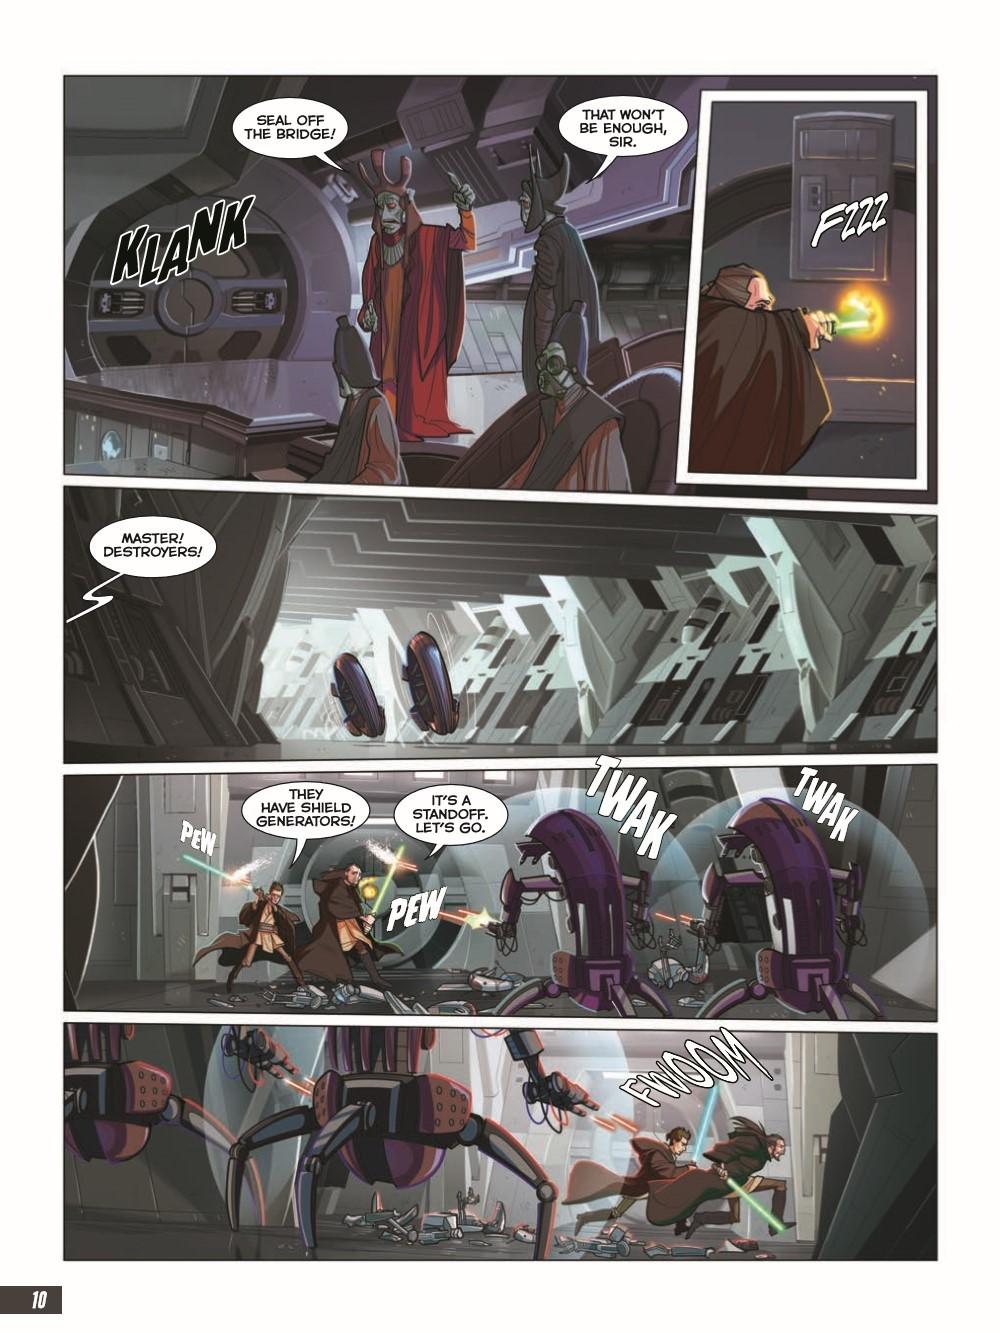 SW_The-Phantom-Menace_pr-6 ComicList Previews: STAR WARS THE PHANTOM MENACE GRAPHIC NOVEL ADAPTATION GN